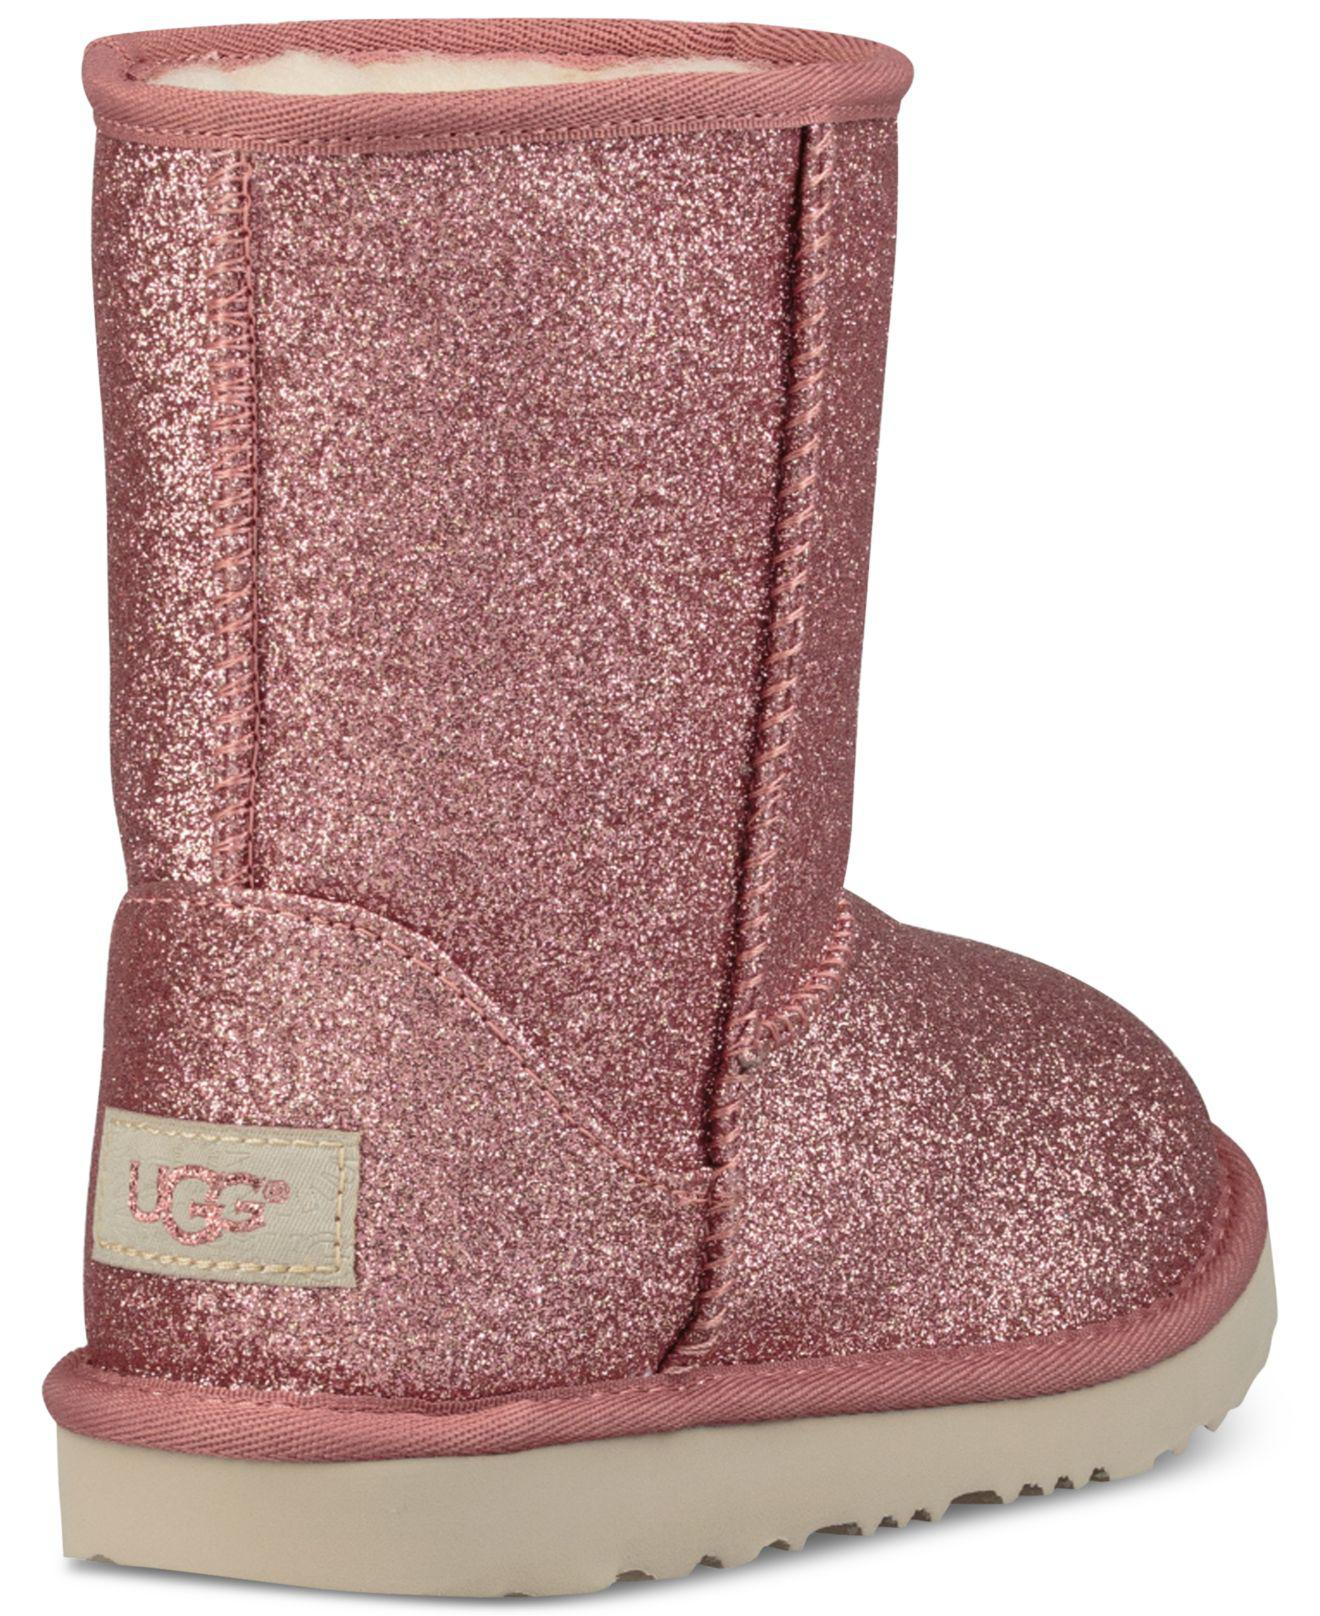 7dc5419f0b6 Ugg Pink Toddler Classic Short Ii Glitter Boots